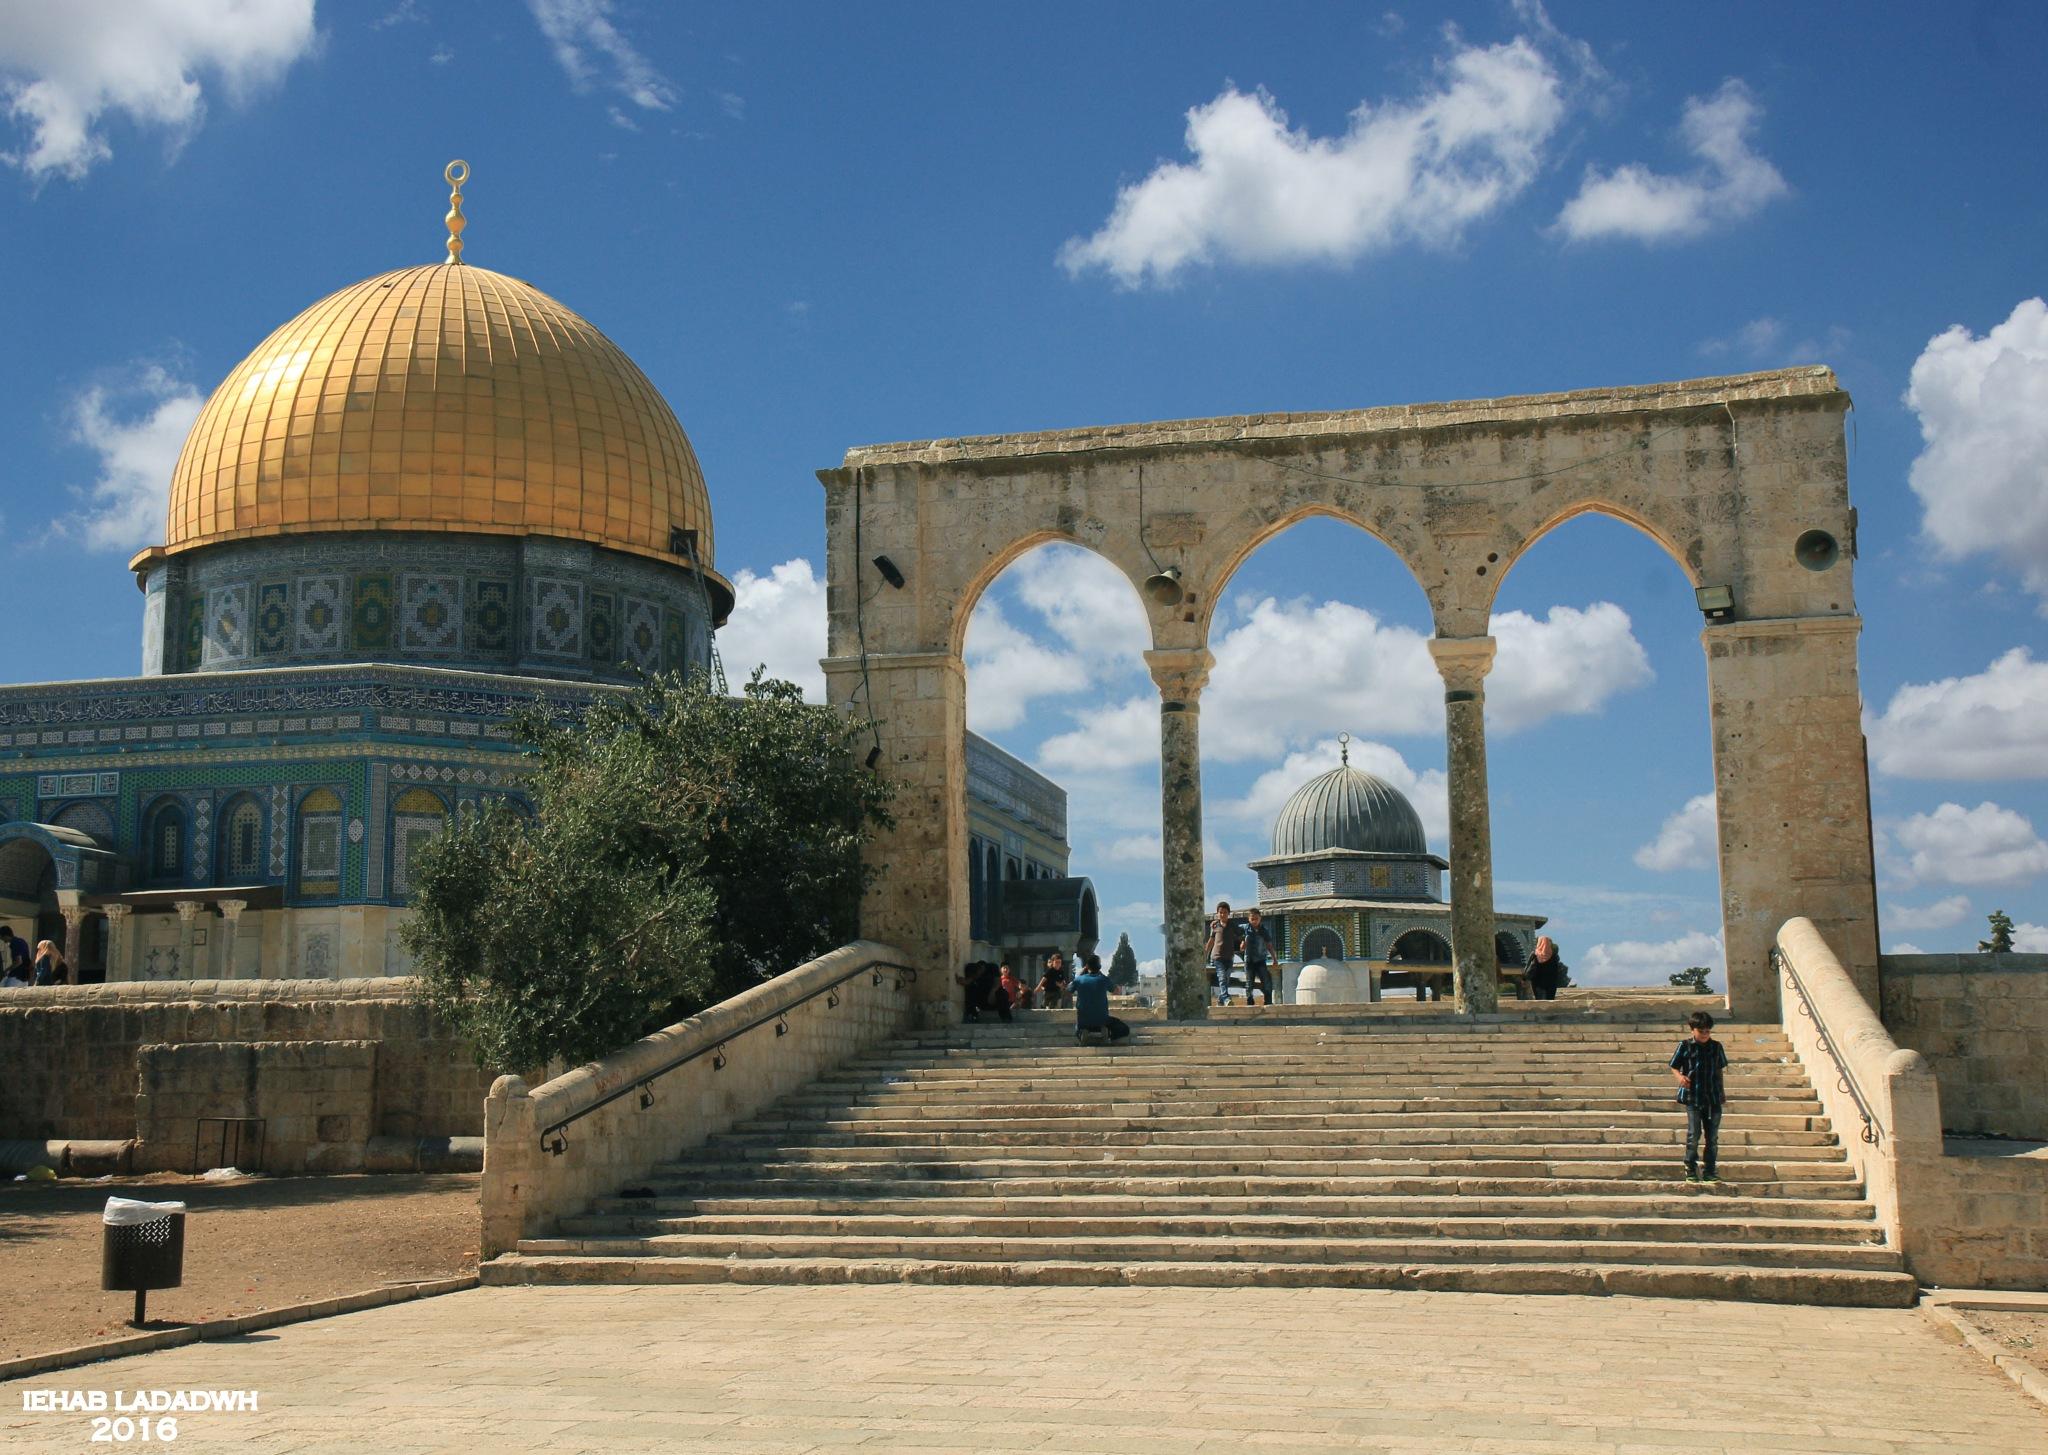 Jerusalem by iehabladadwh